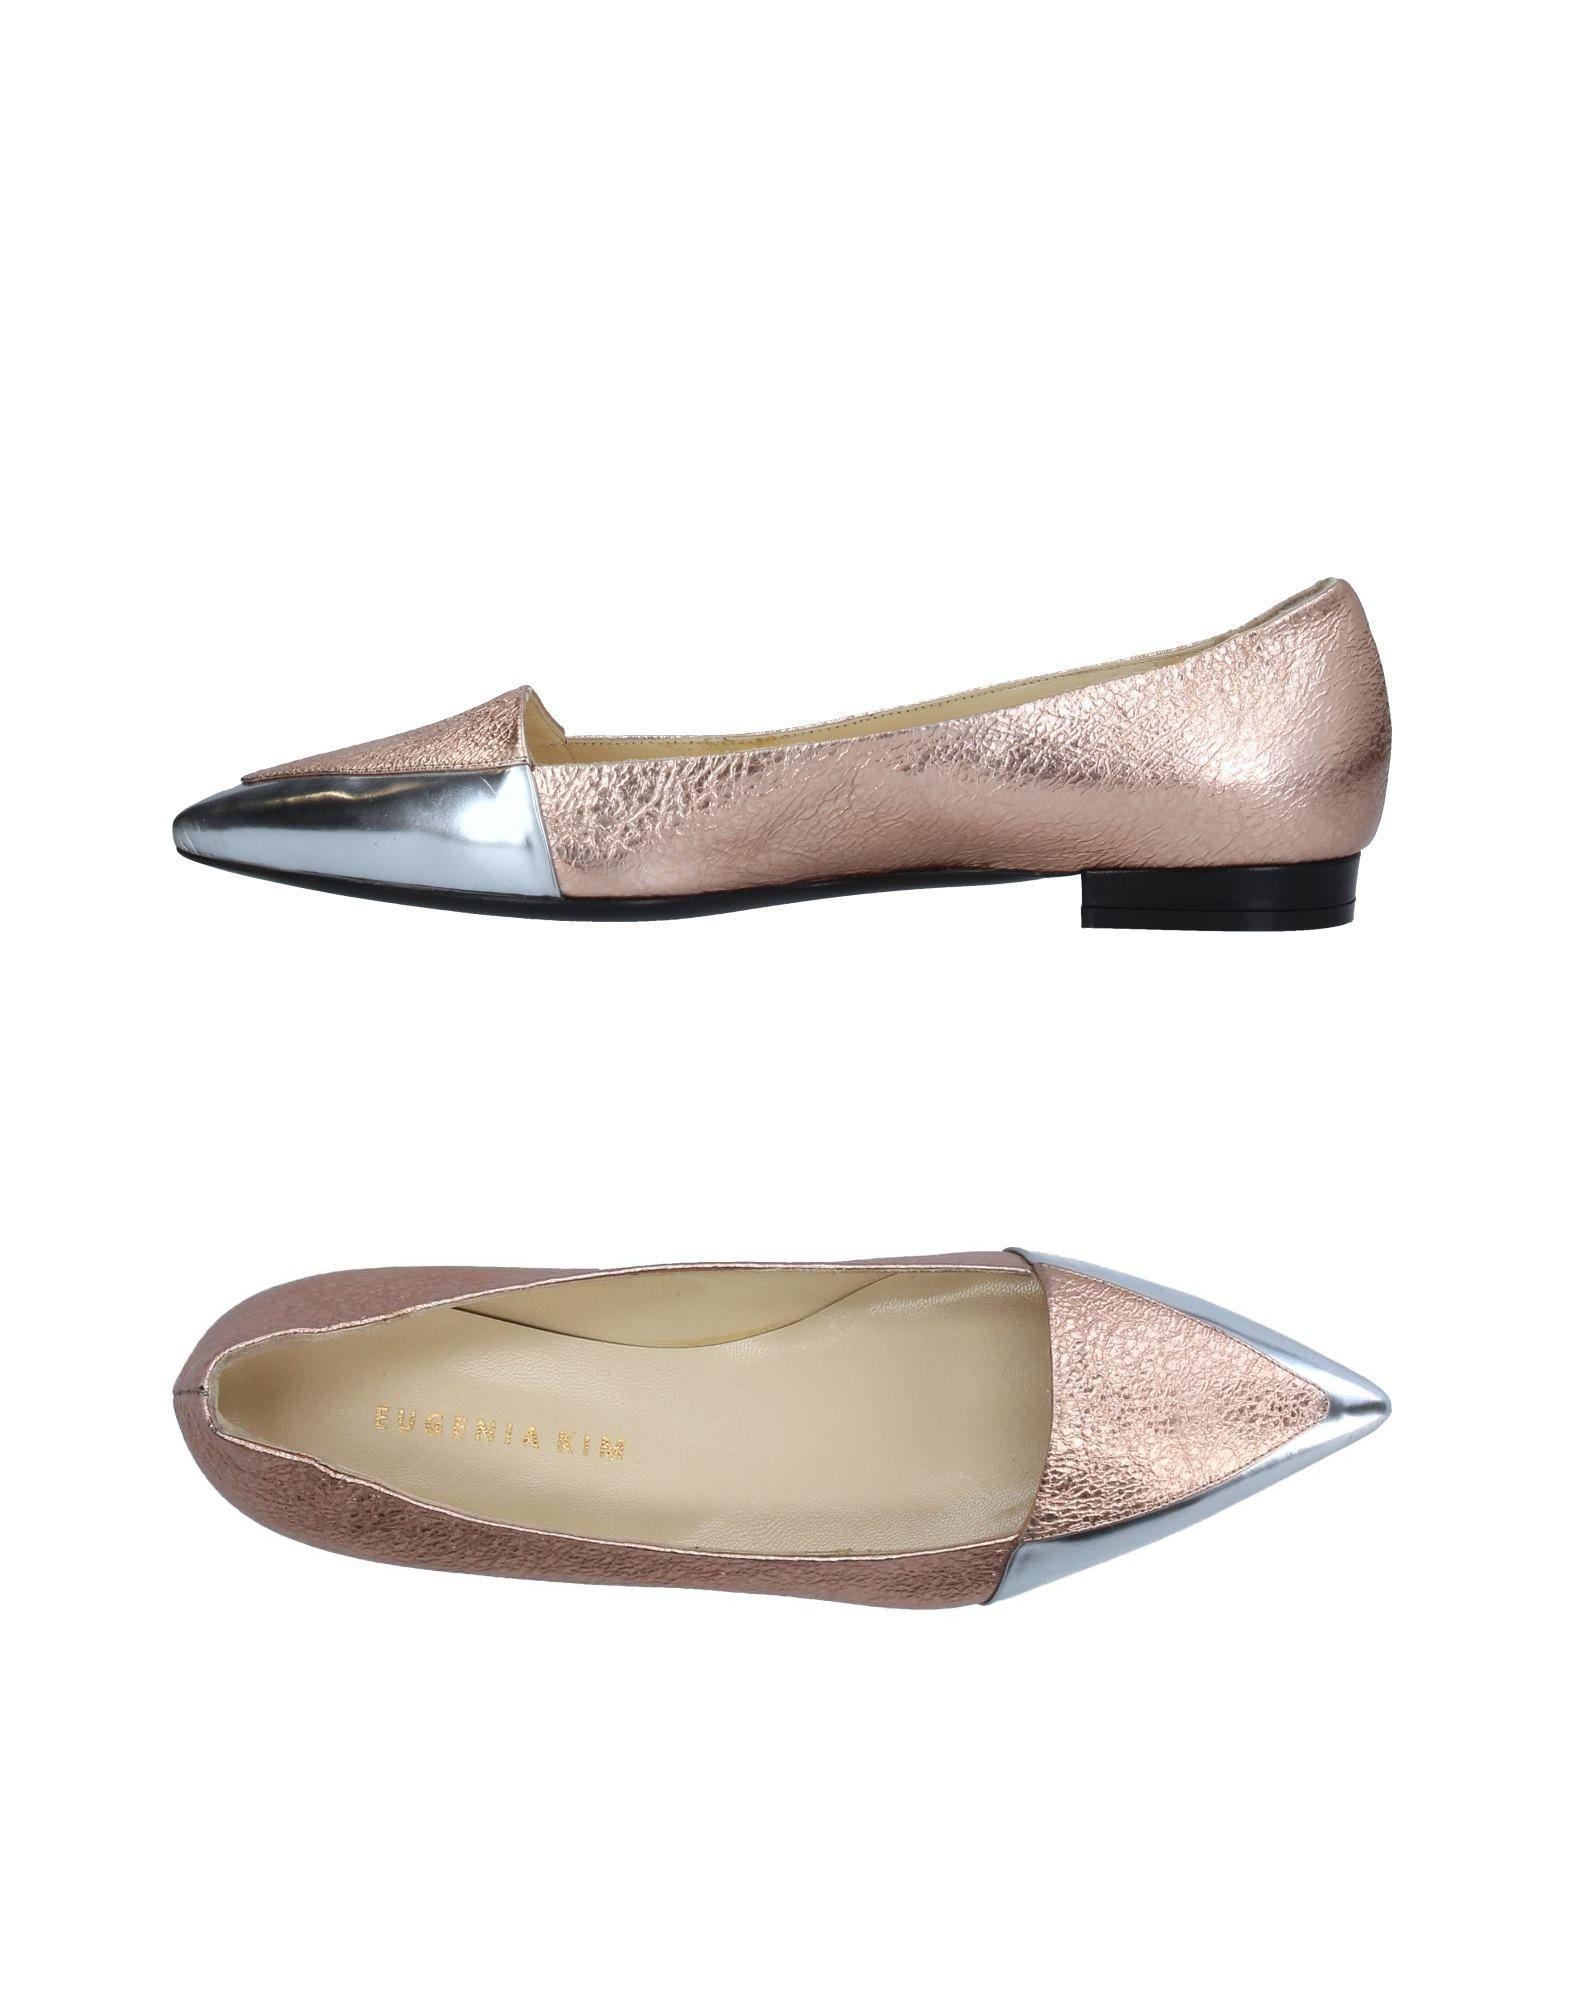 Stilvolle billige Schuhe Eugenia Kim Ballerinas Damen  11357844AR